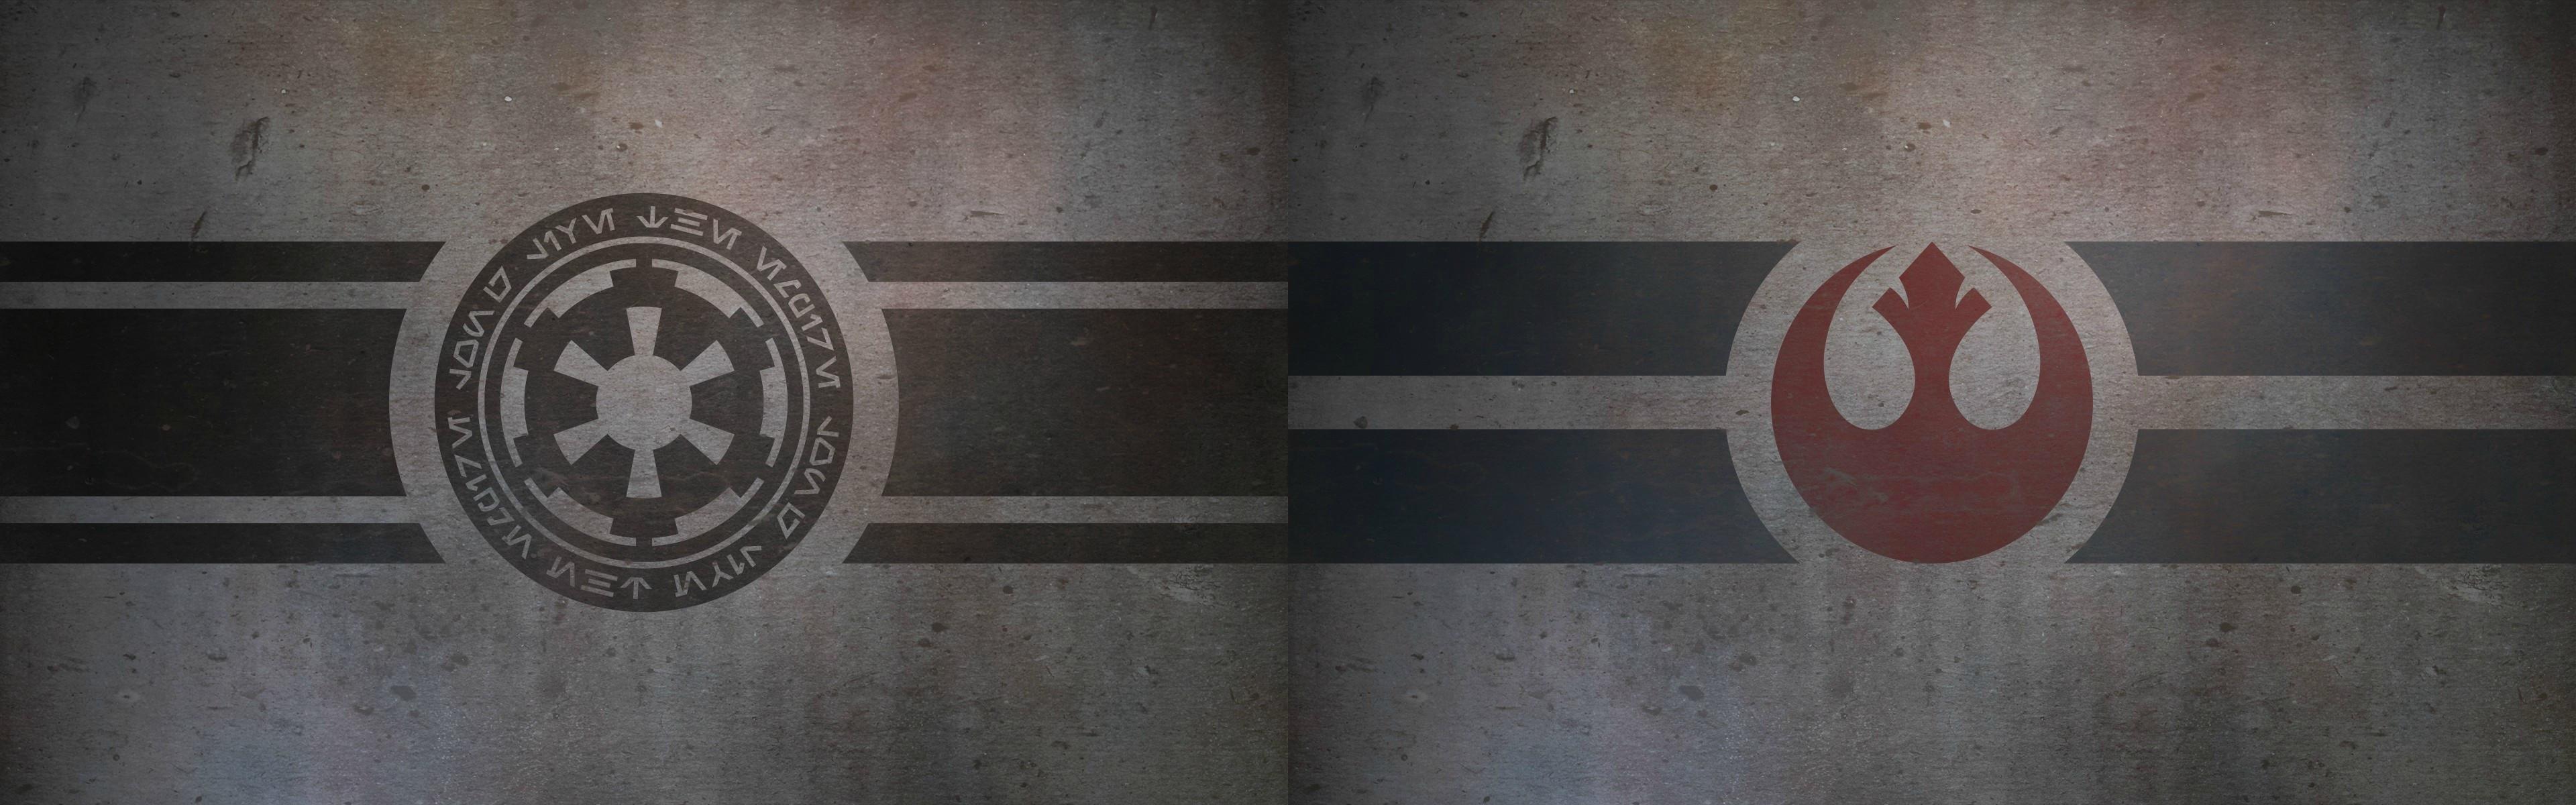 Neat star wars, dual monitor wallpapers  - Album on Imgur